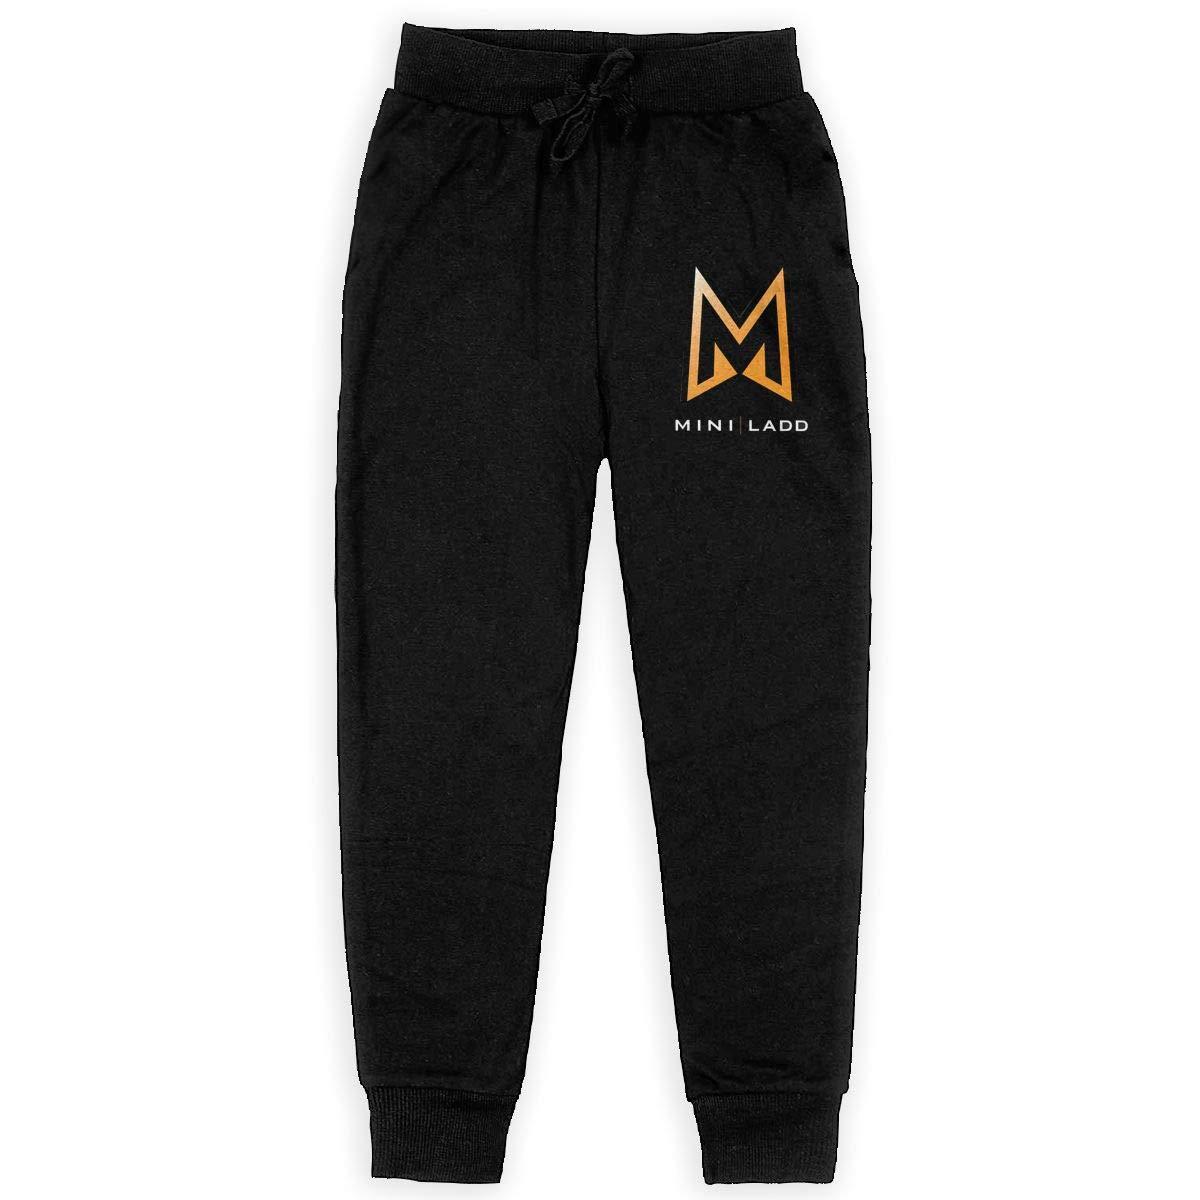 CustomART Mini Ladd Youth Soft and Cozy Sweatpants Sizes Youth M-XL